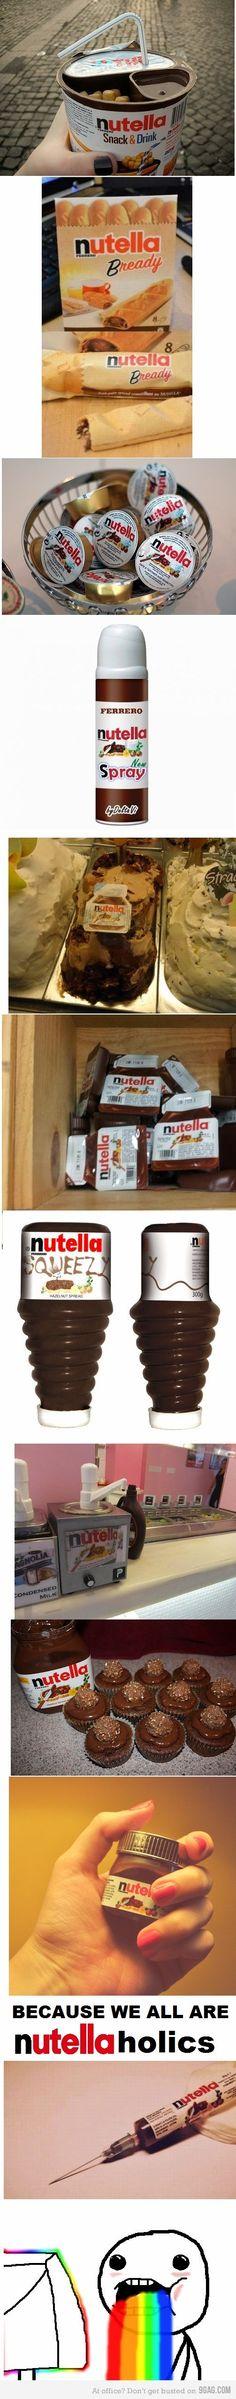 Nutella by leylei